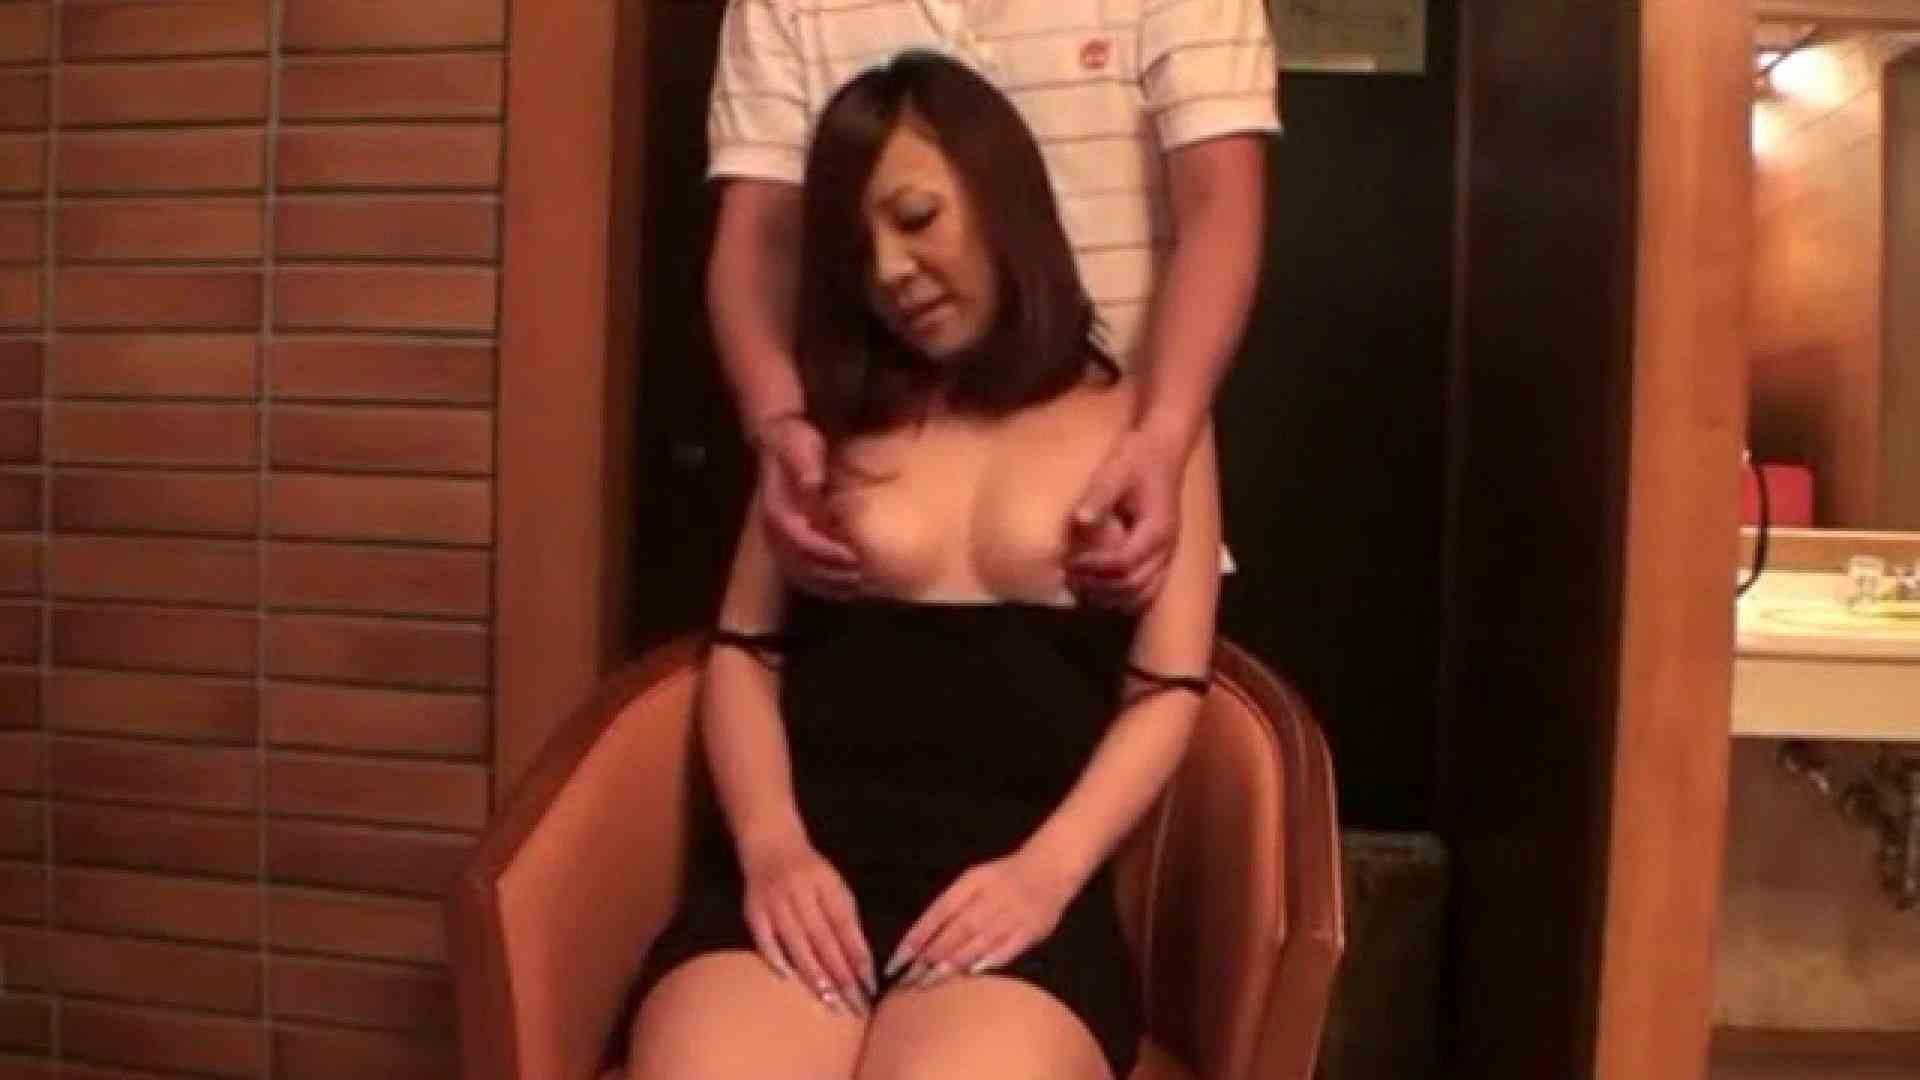 S級厳選美女ビッチガールVol.10 OLセックス | 美女ヌード  51画像 1